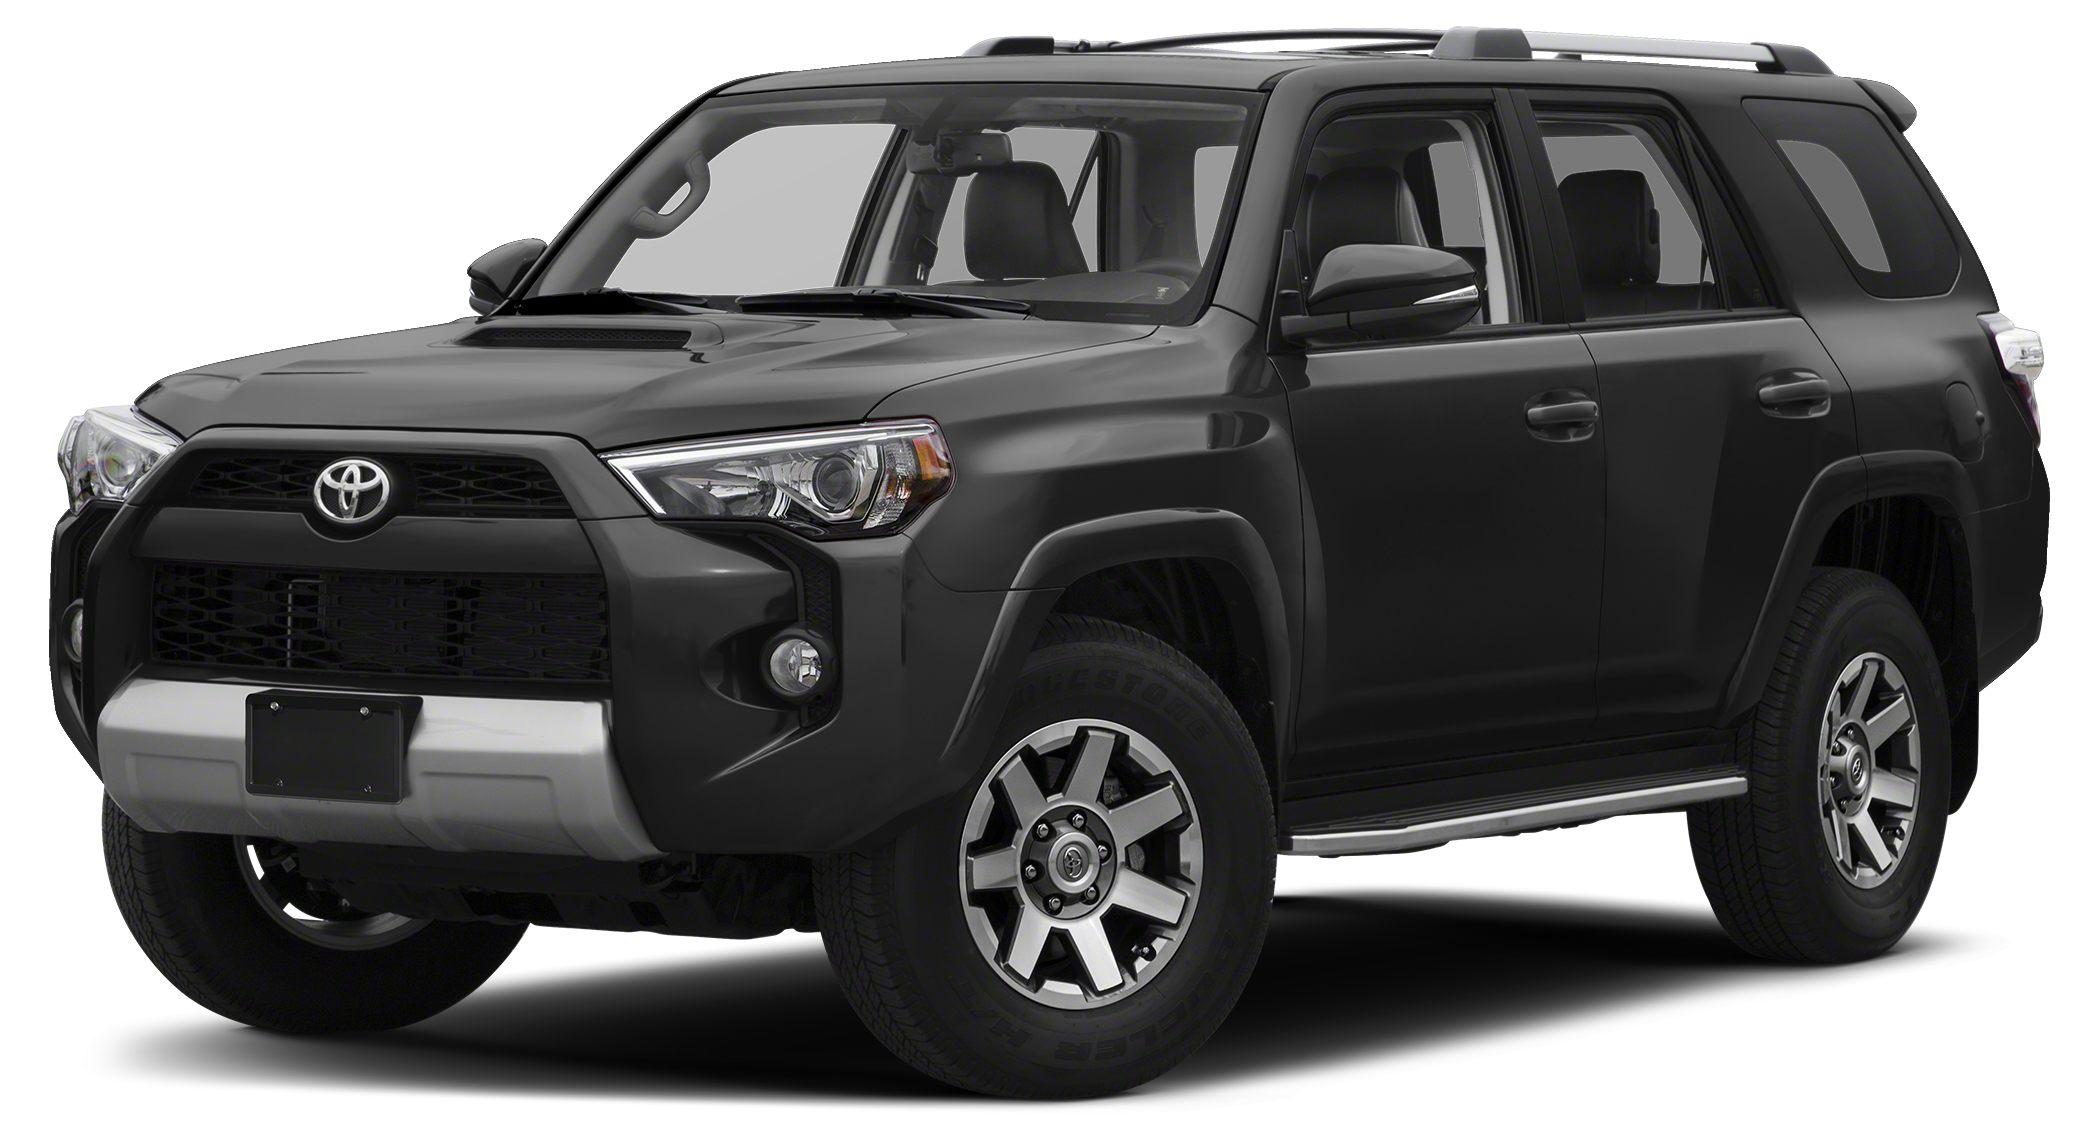 2018 Toyota 4Runner TRD Off Road Magnetic Gray Metallic TRD Off-Road Keep It Wild Savings 4WD Al